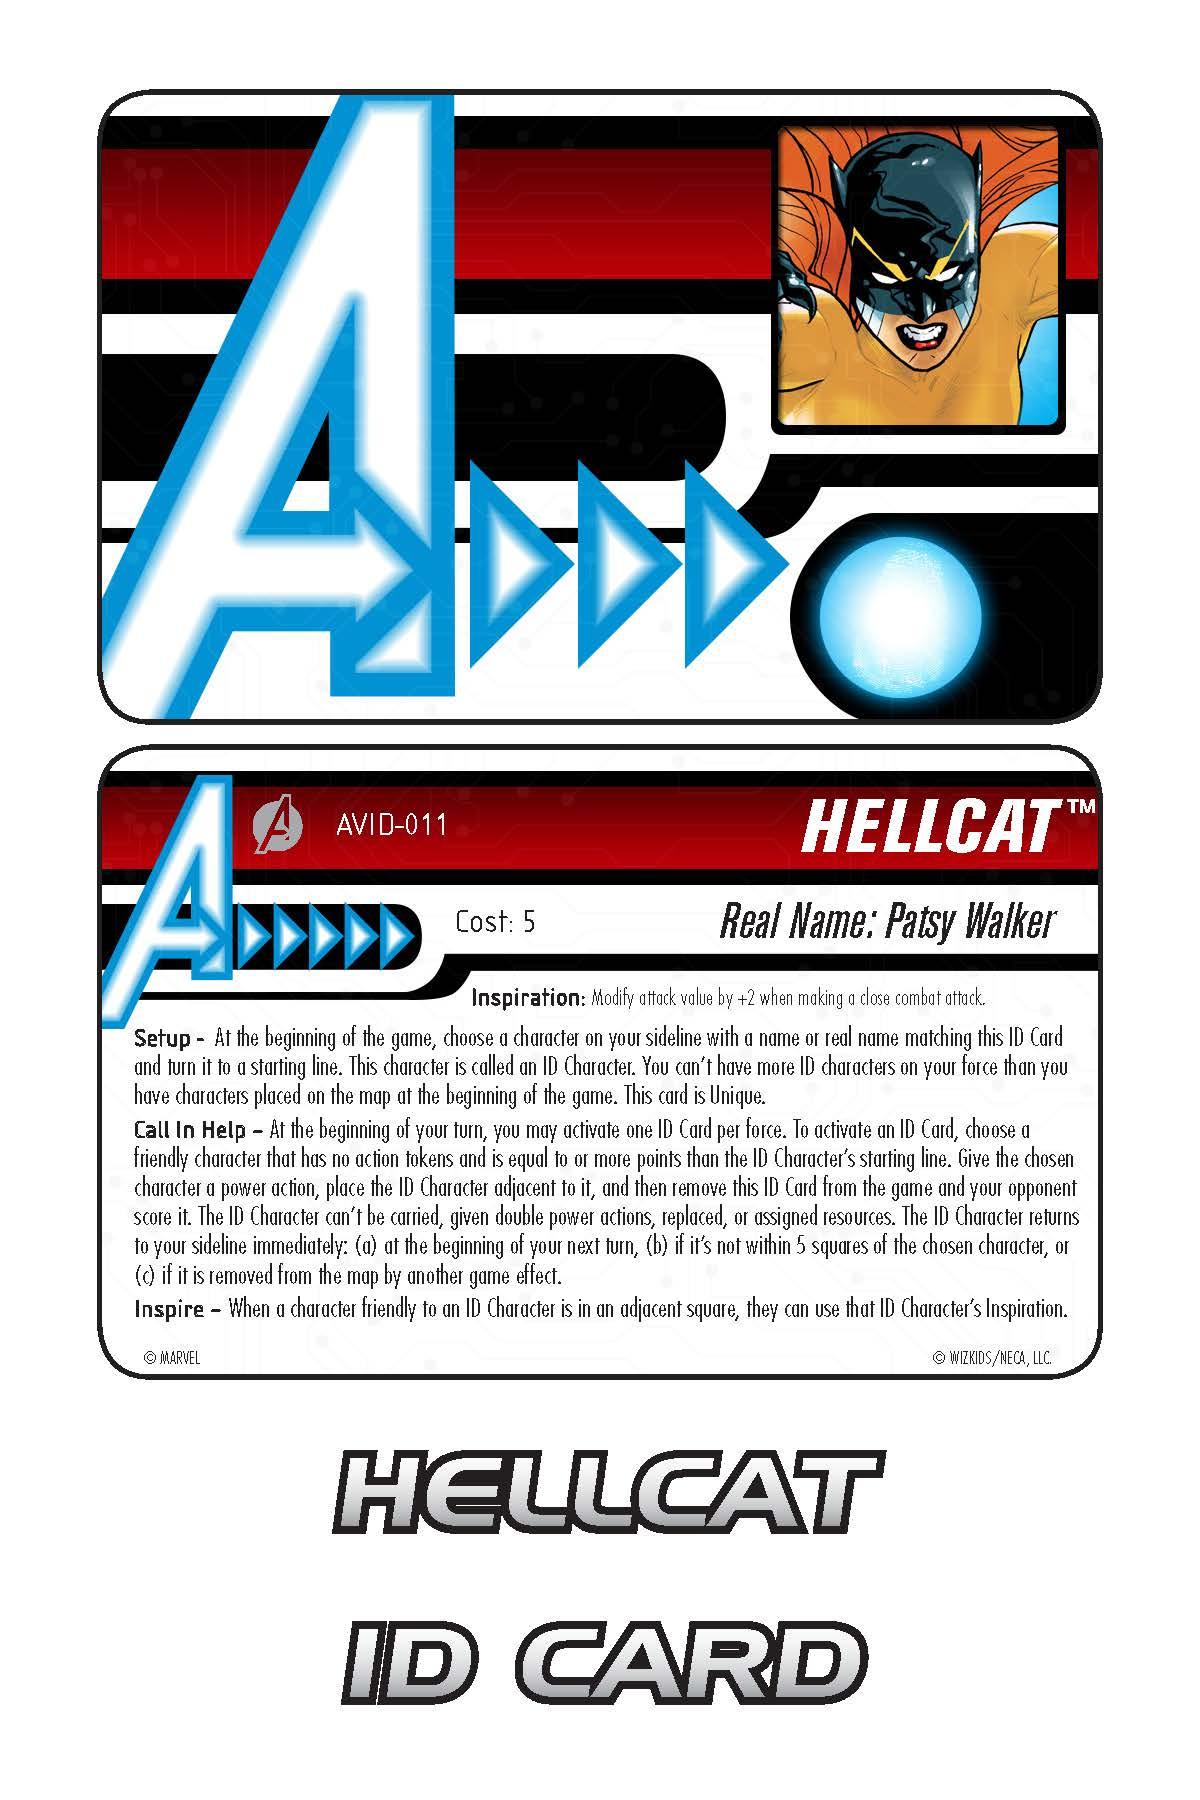 Marvel HeroClix: Avengers ID Card- Hellcat